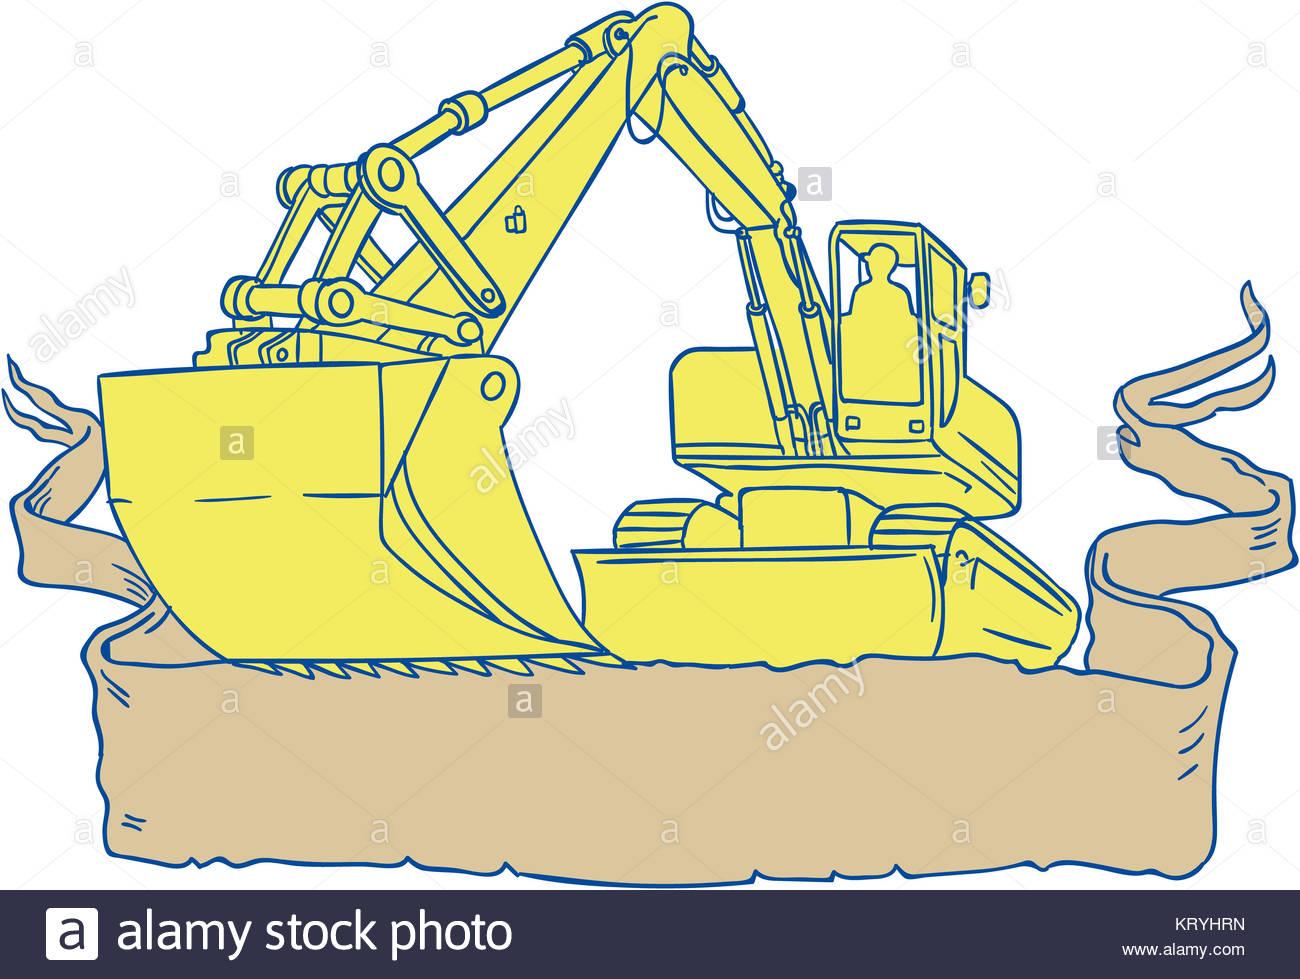 1300x979 Mechanical Digger Excavator Ribbon Scroll Drawing Stock Photo